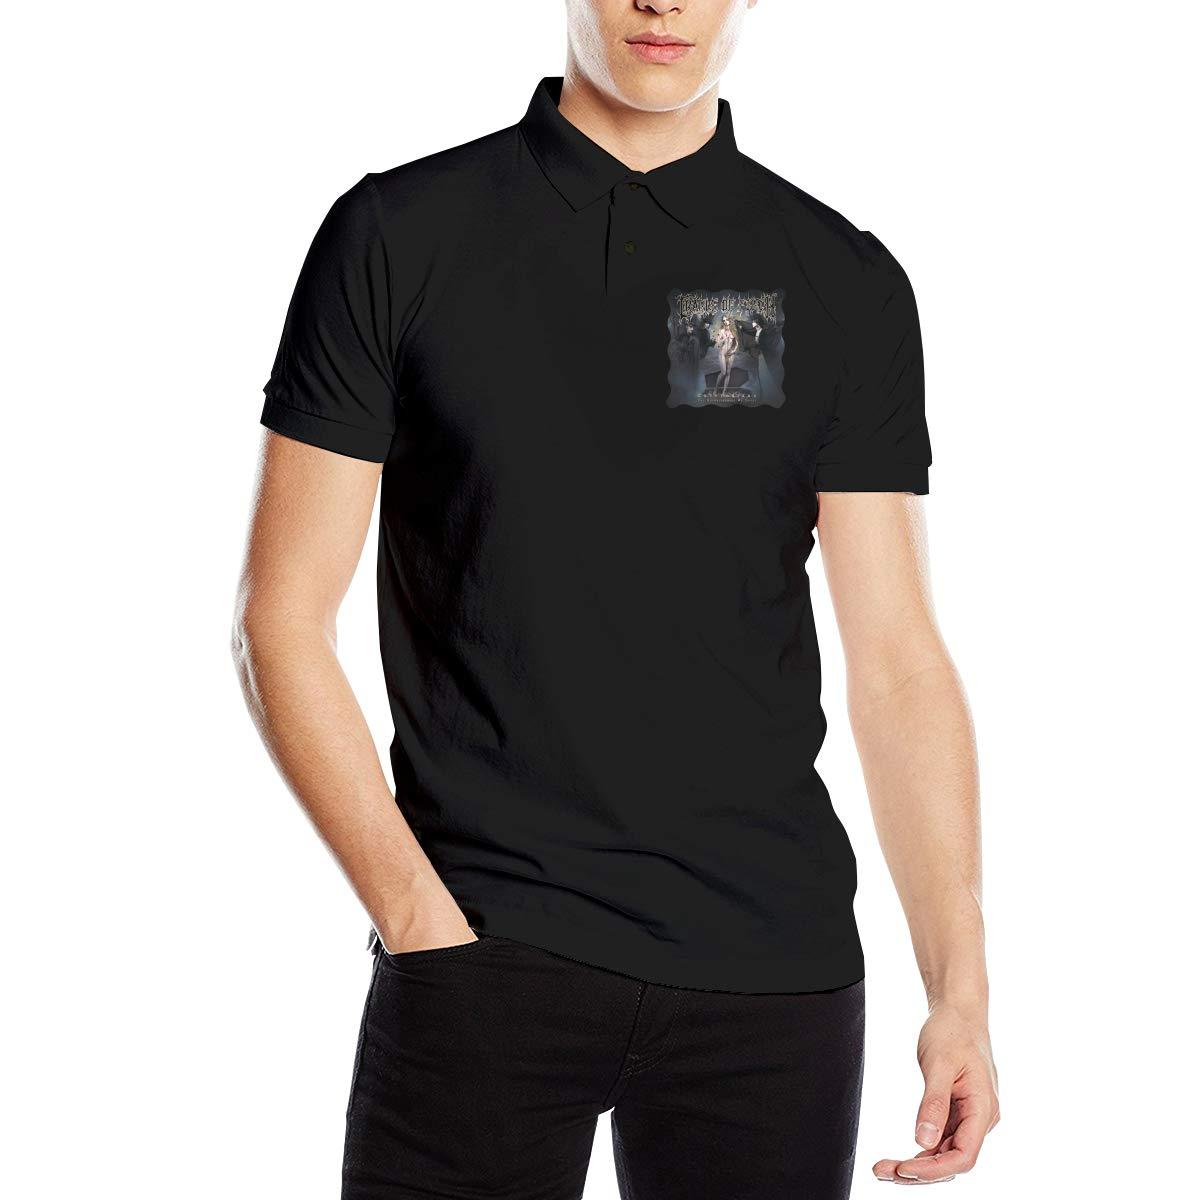 Cjlrqone Cradle of Filth Men Fashion Polo Shirts Black